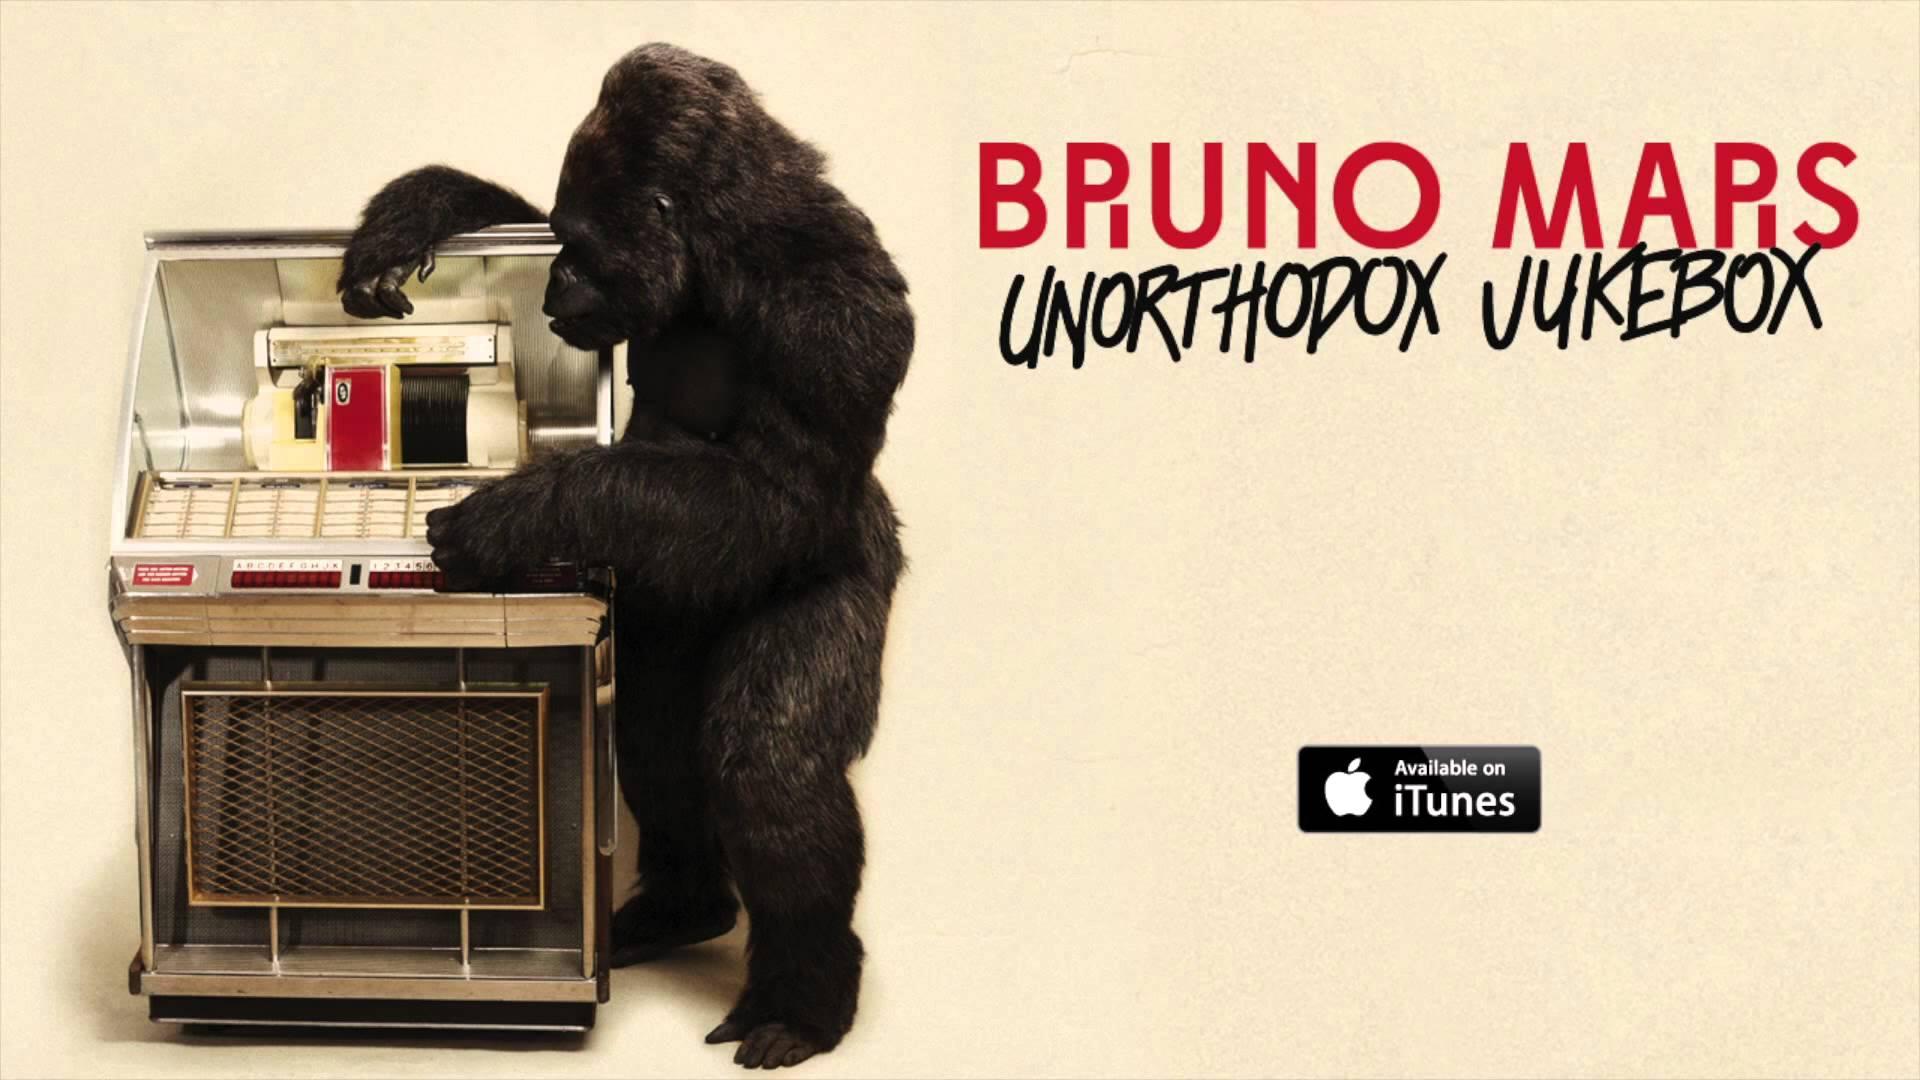 Bruno Mars - Unorthodox Jukebox HD Wallpaper